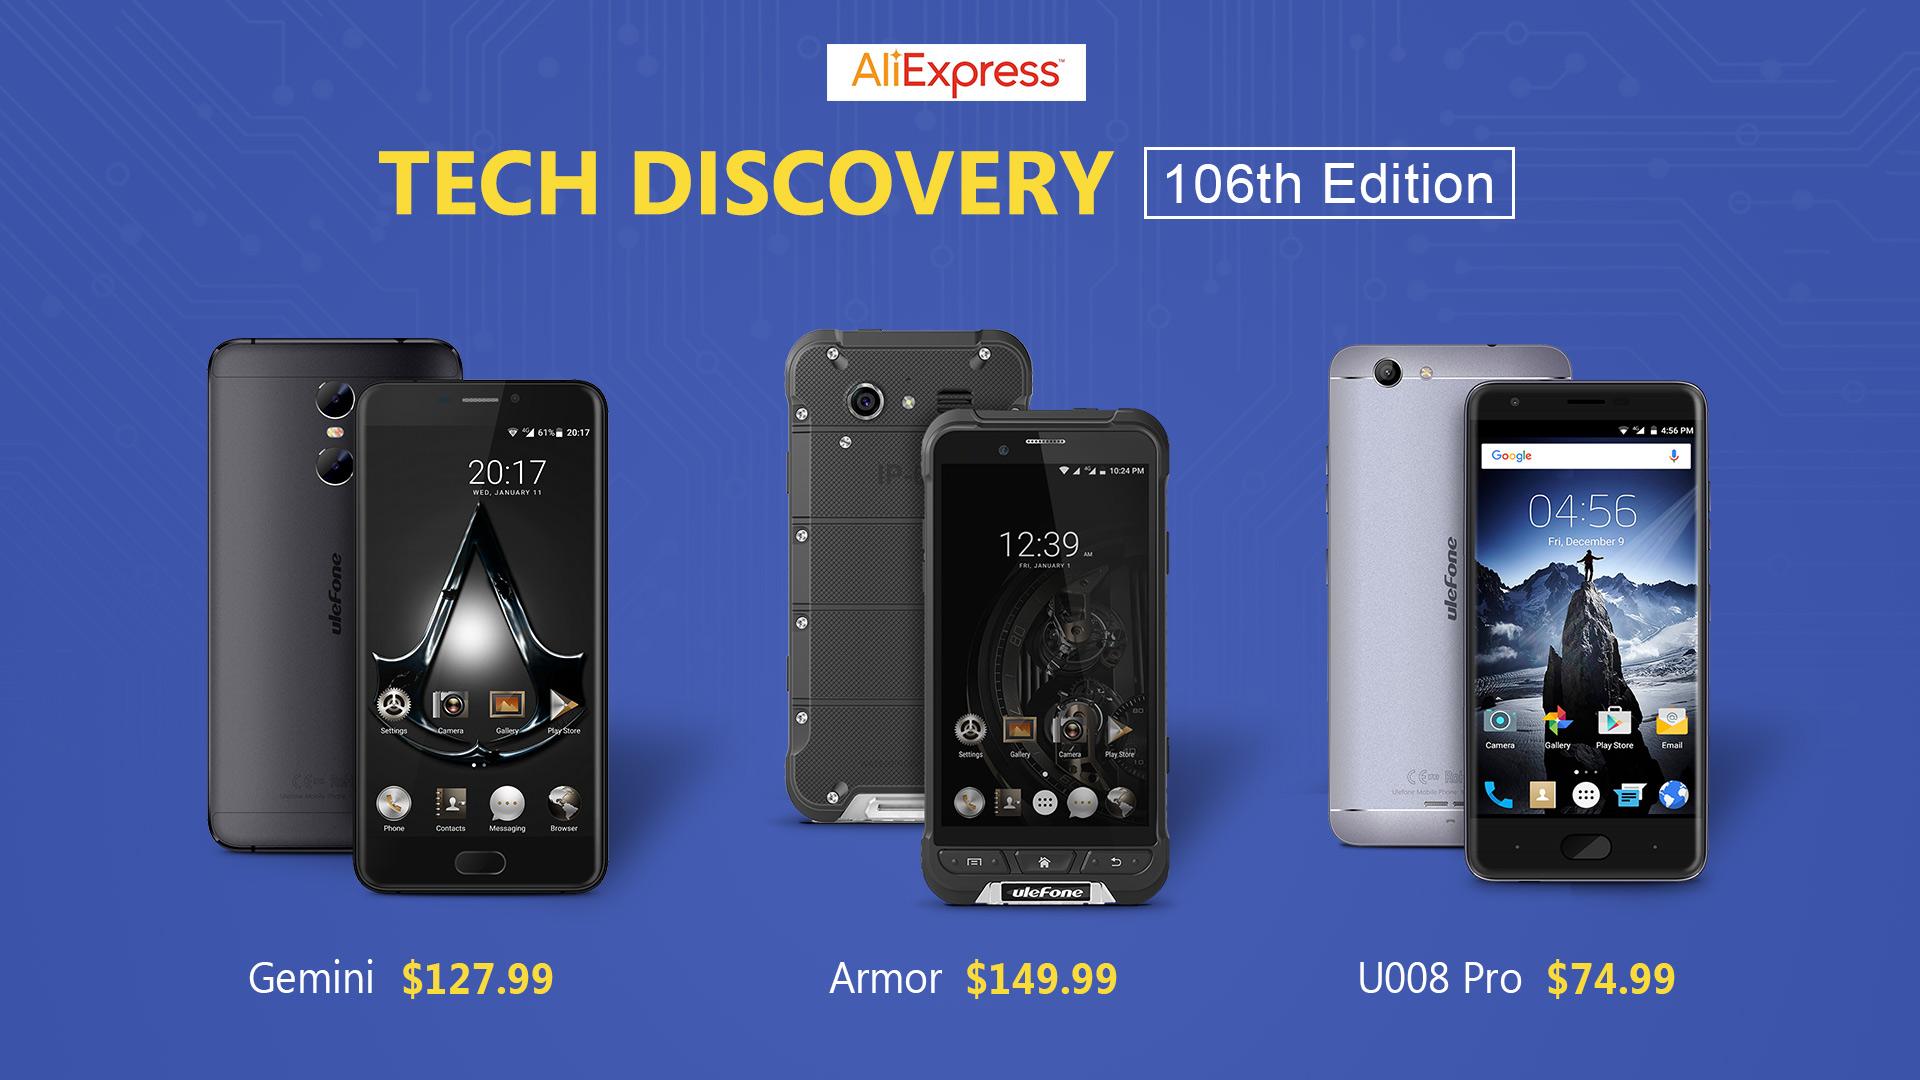 Offerte Aliexpress Ulefone Gemini, Ulefone U008 Pro e Ulefone Armor